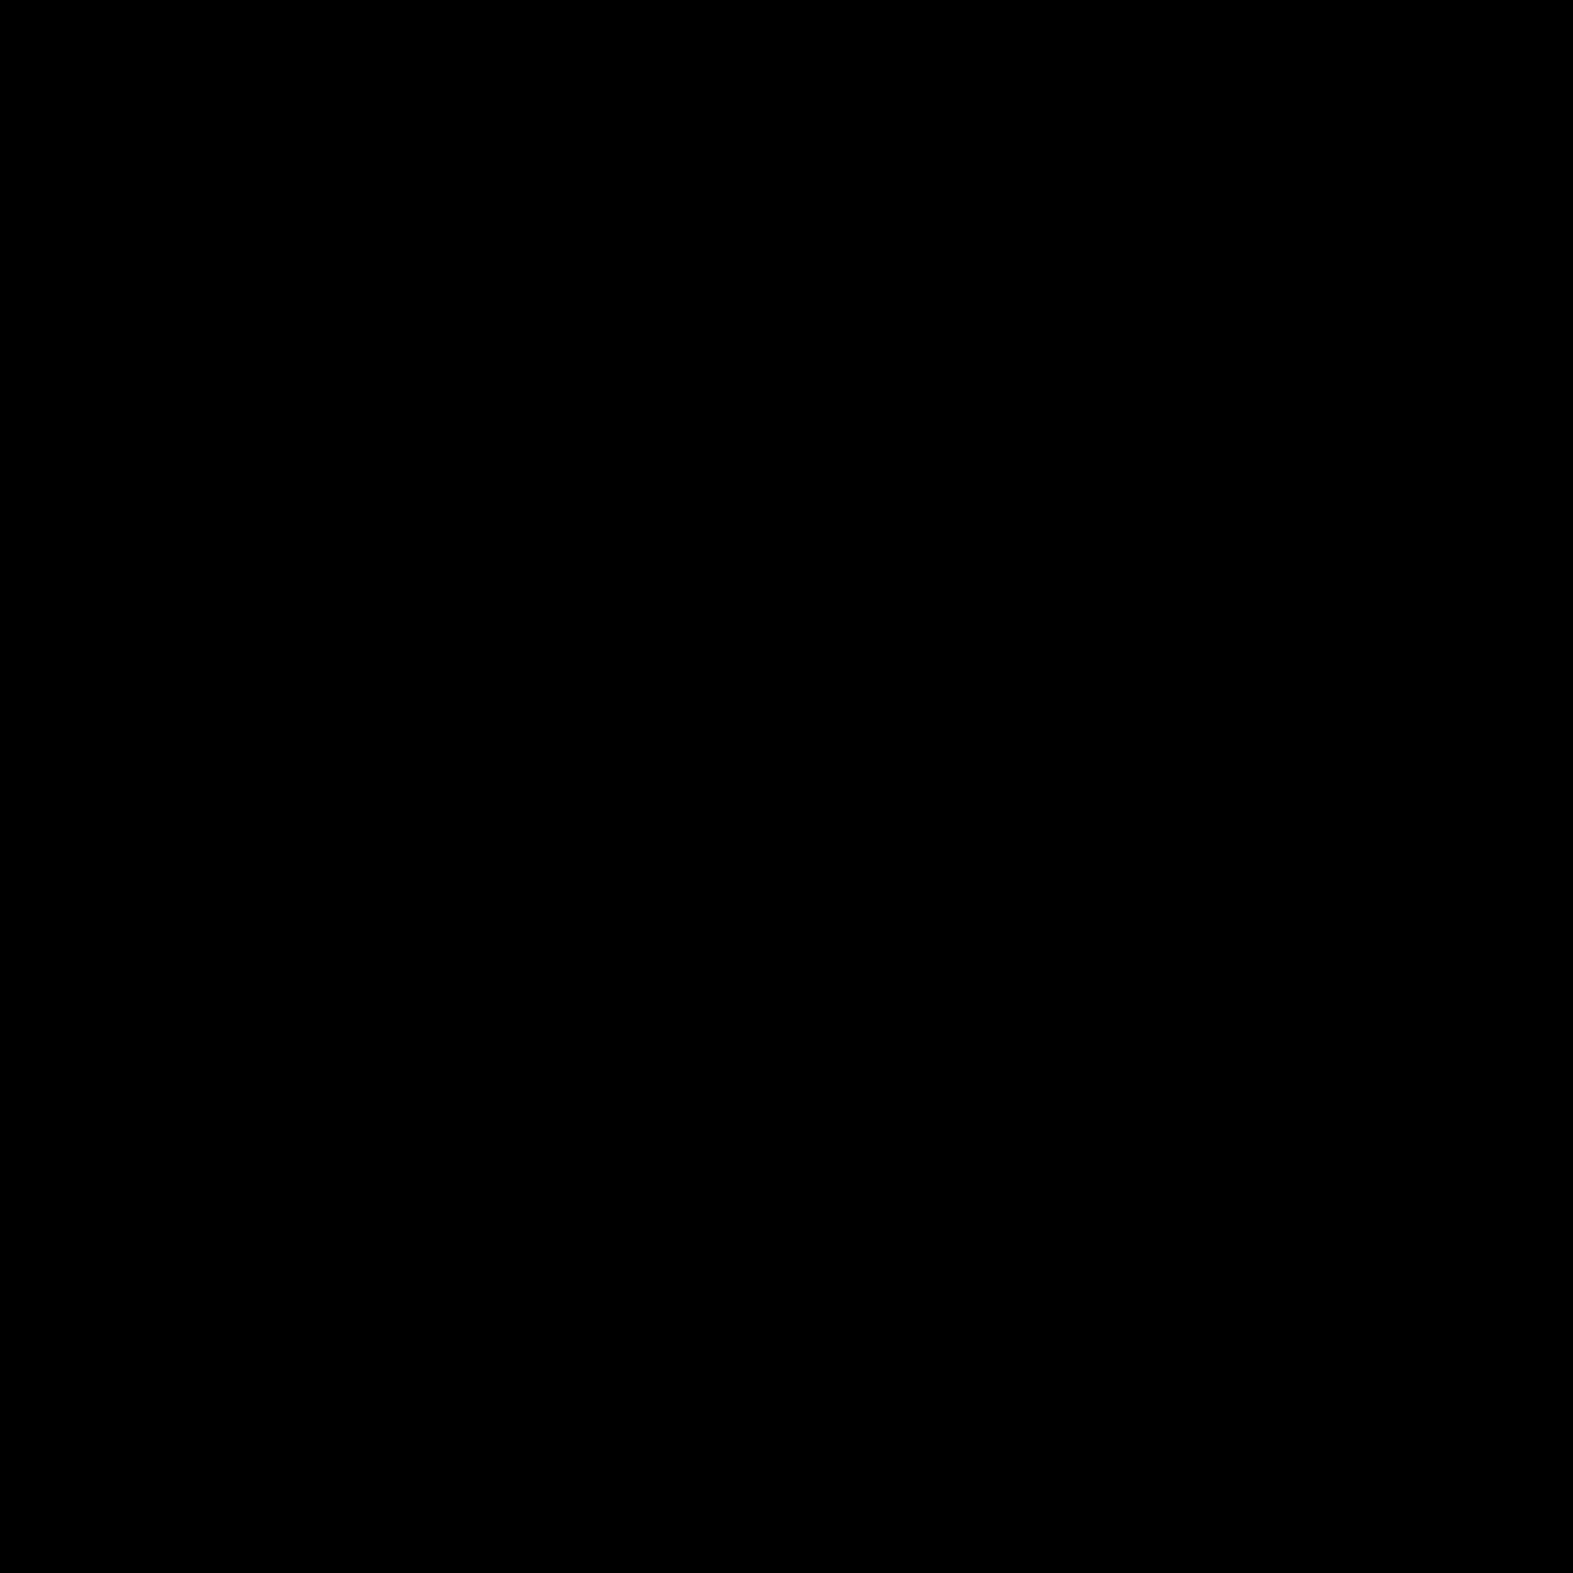 file8-5